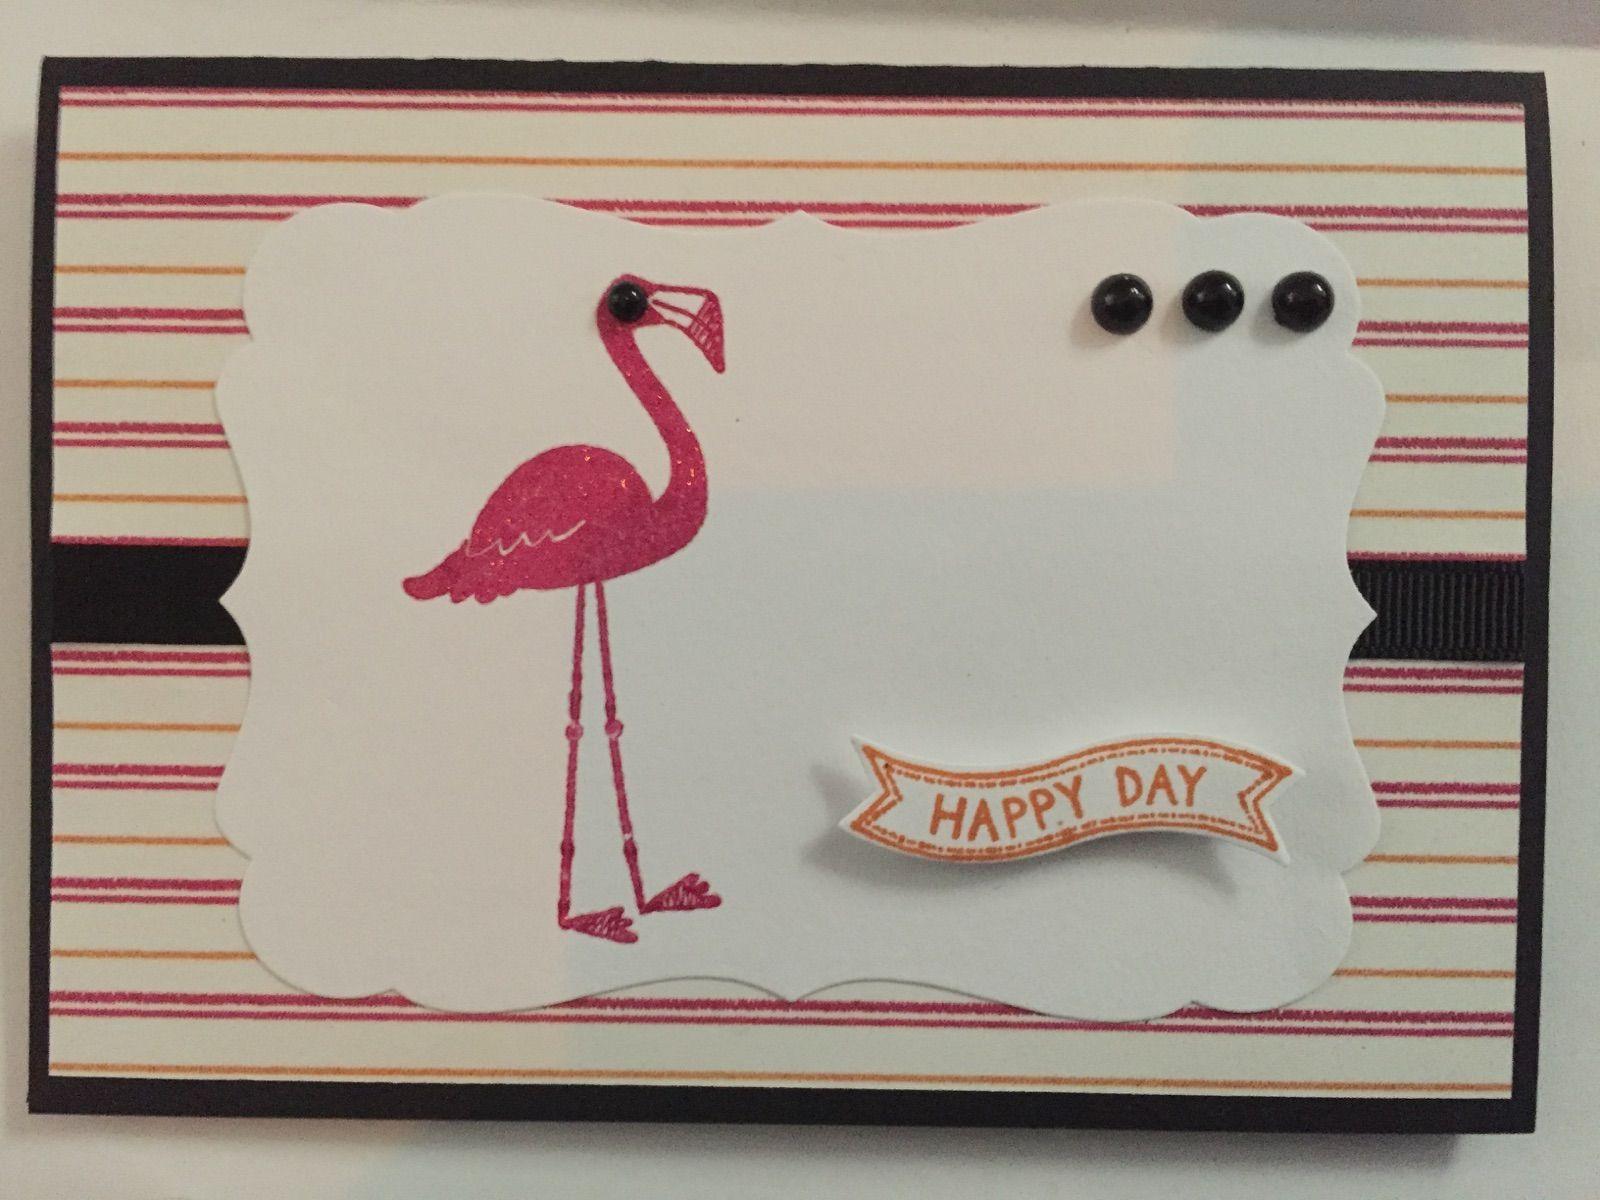 Flamingo birthday card using Stampin Up s Flamingo Lingo and Bitty